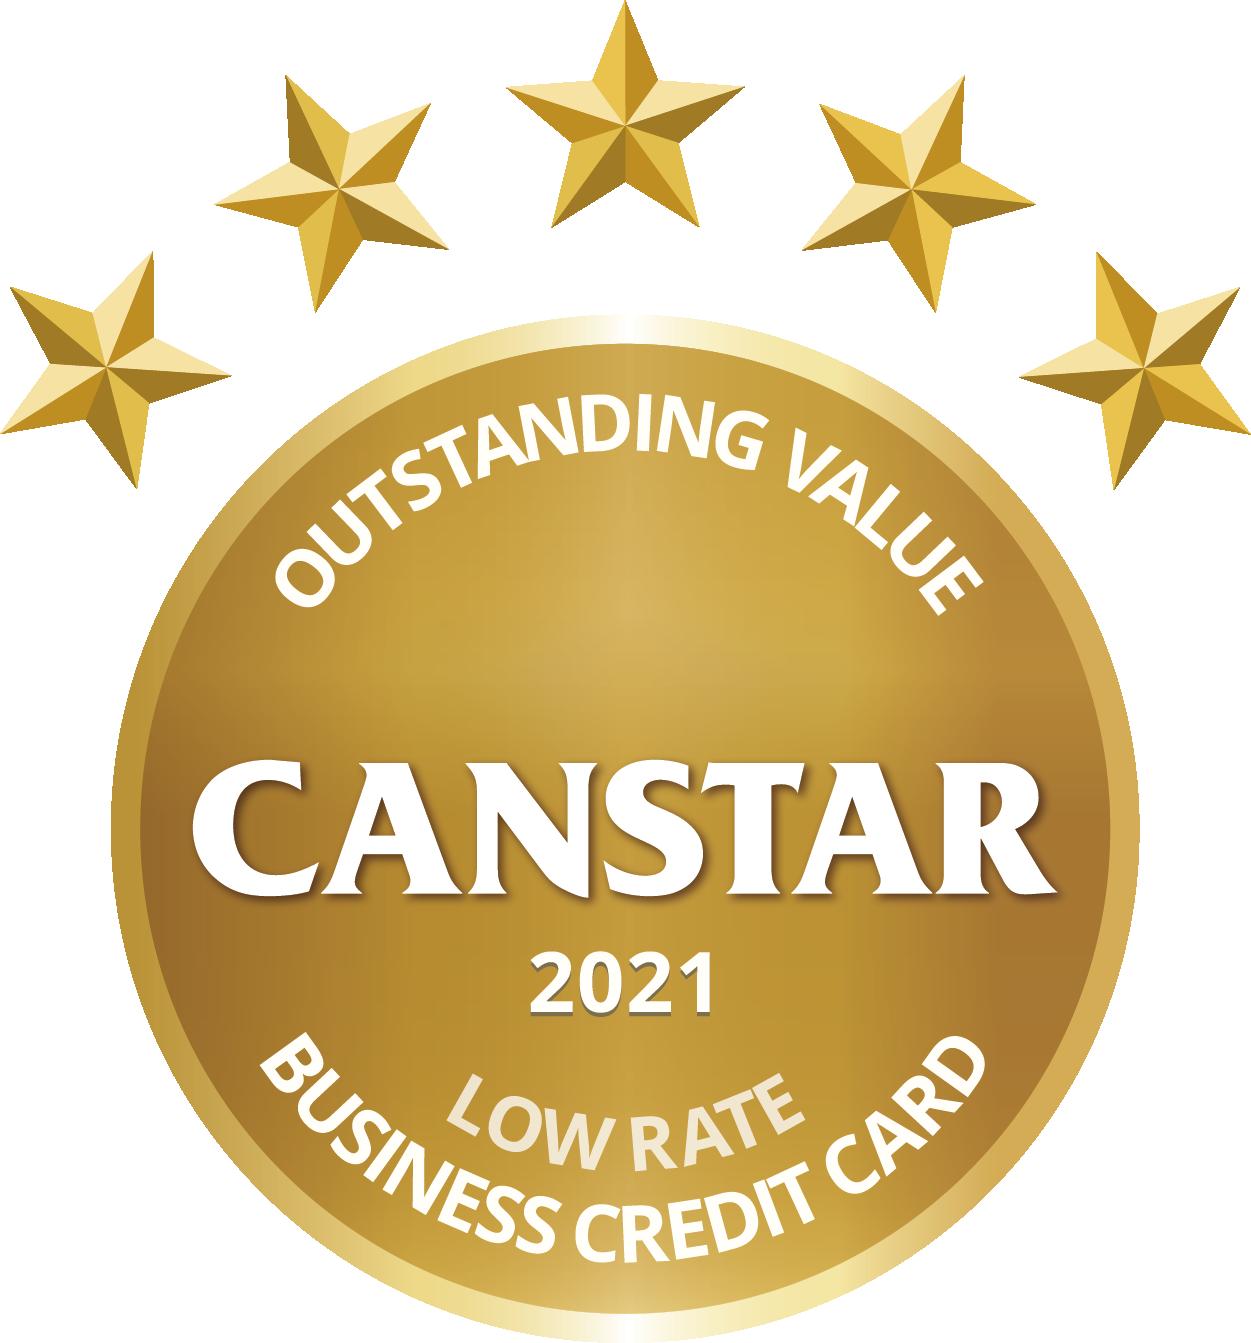 low rate business credit card award logo